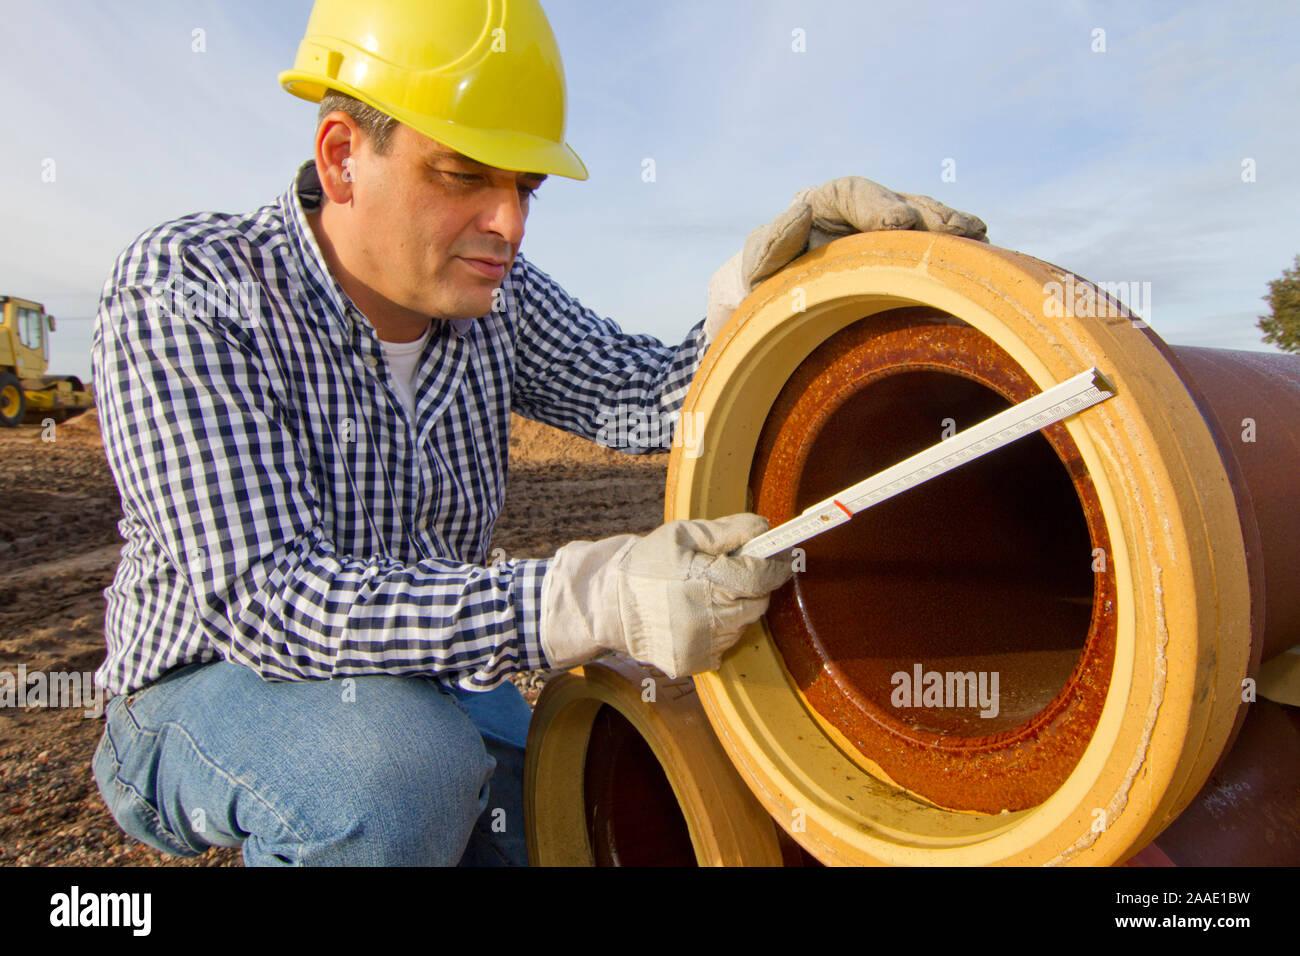 Bauarbeiter arbeitet mit Rohr Stock Photo